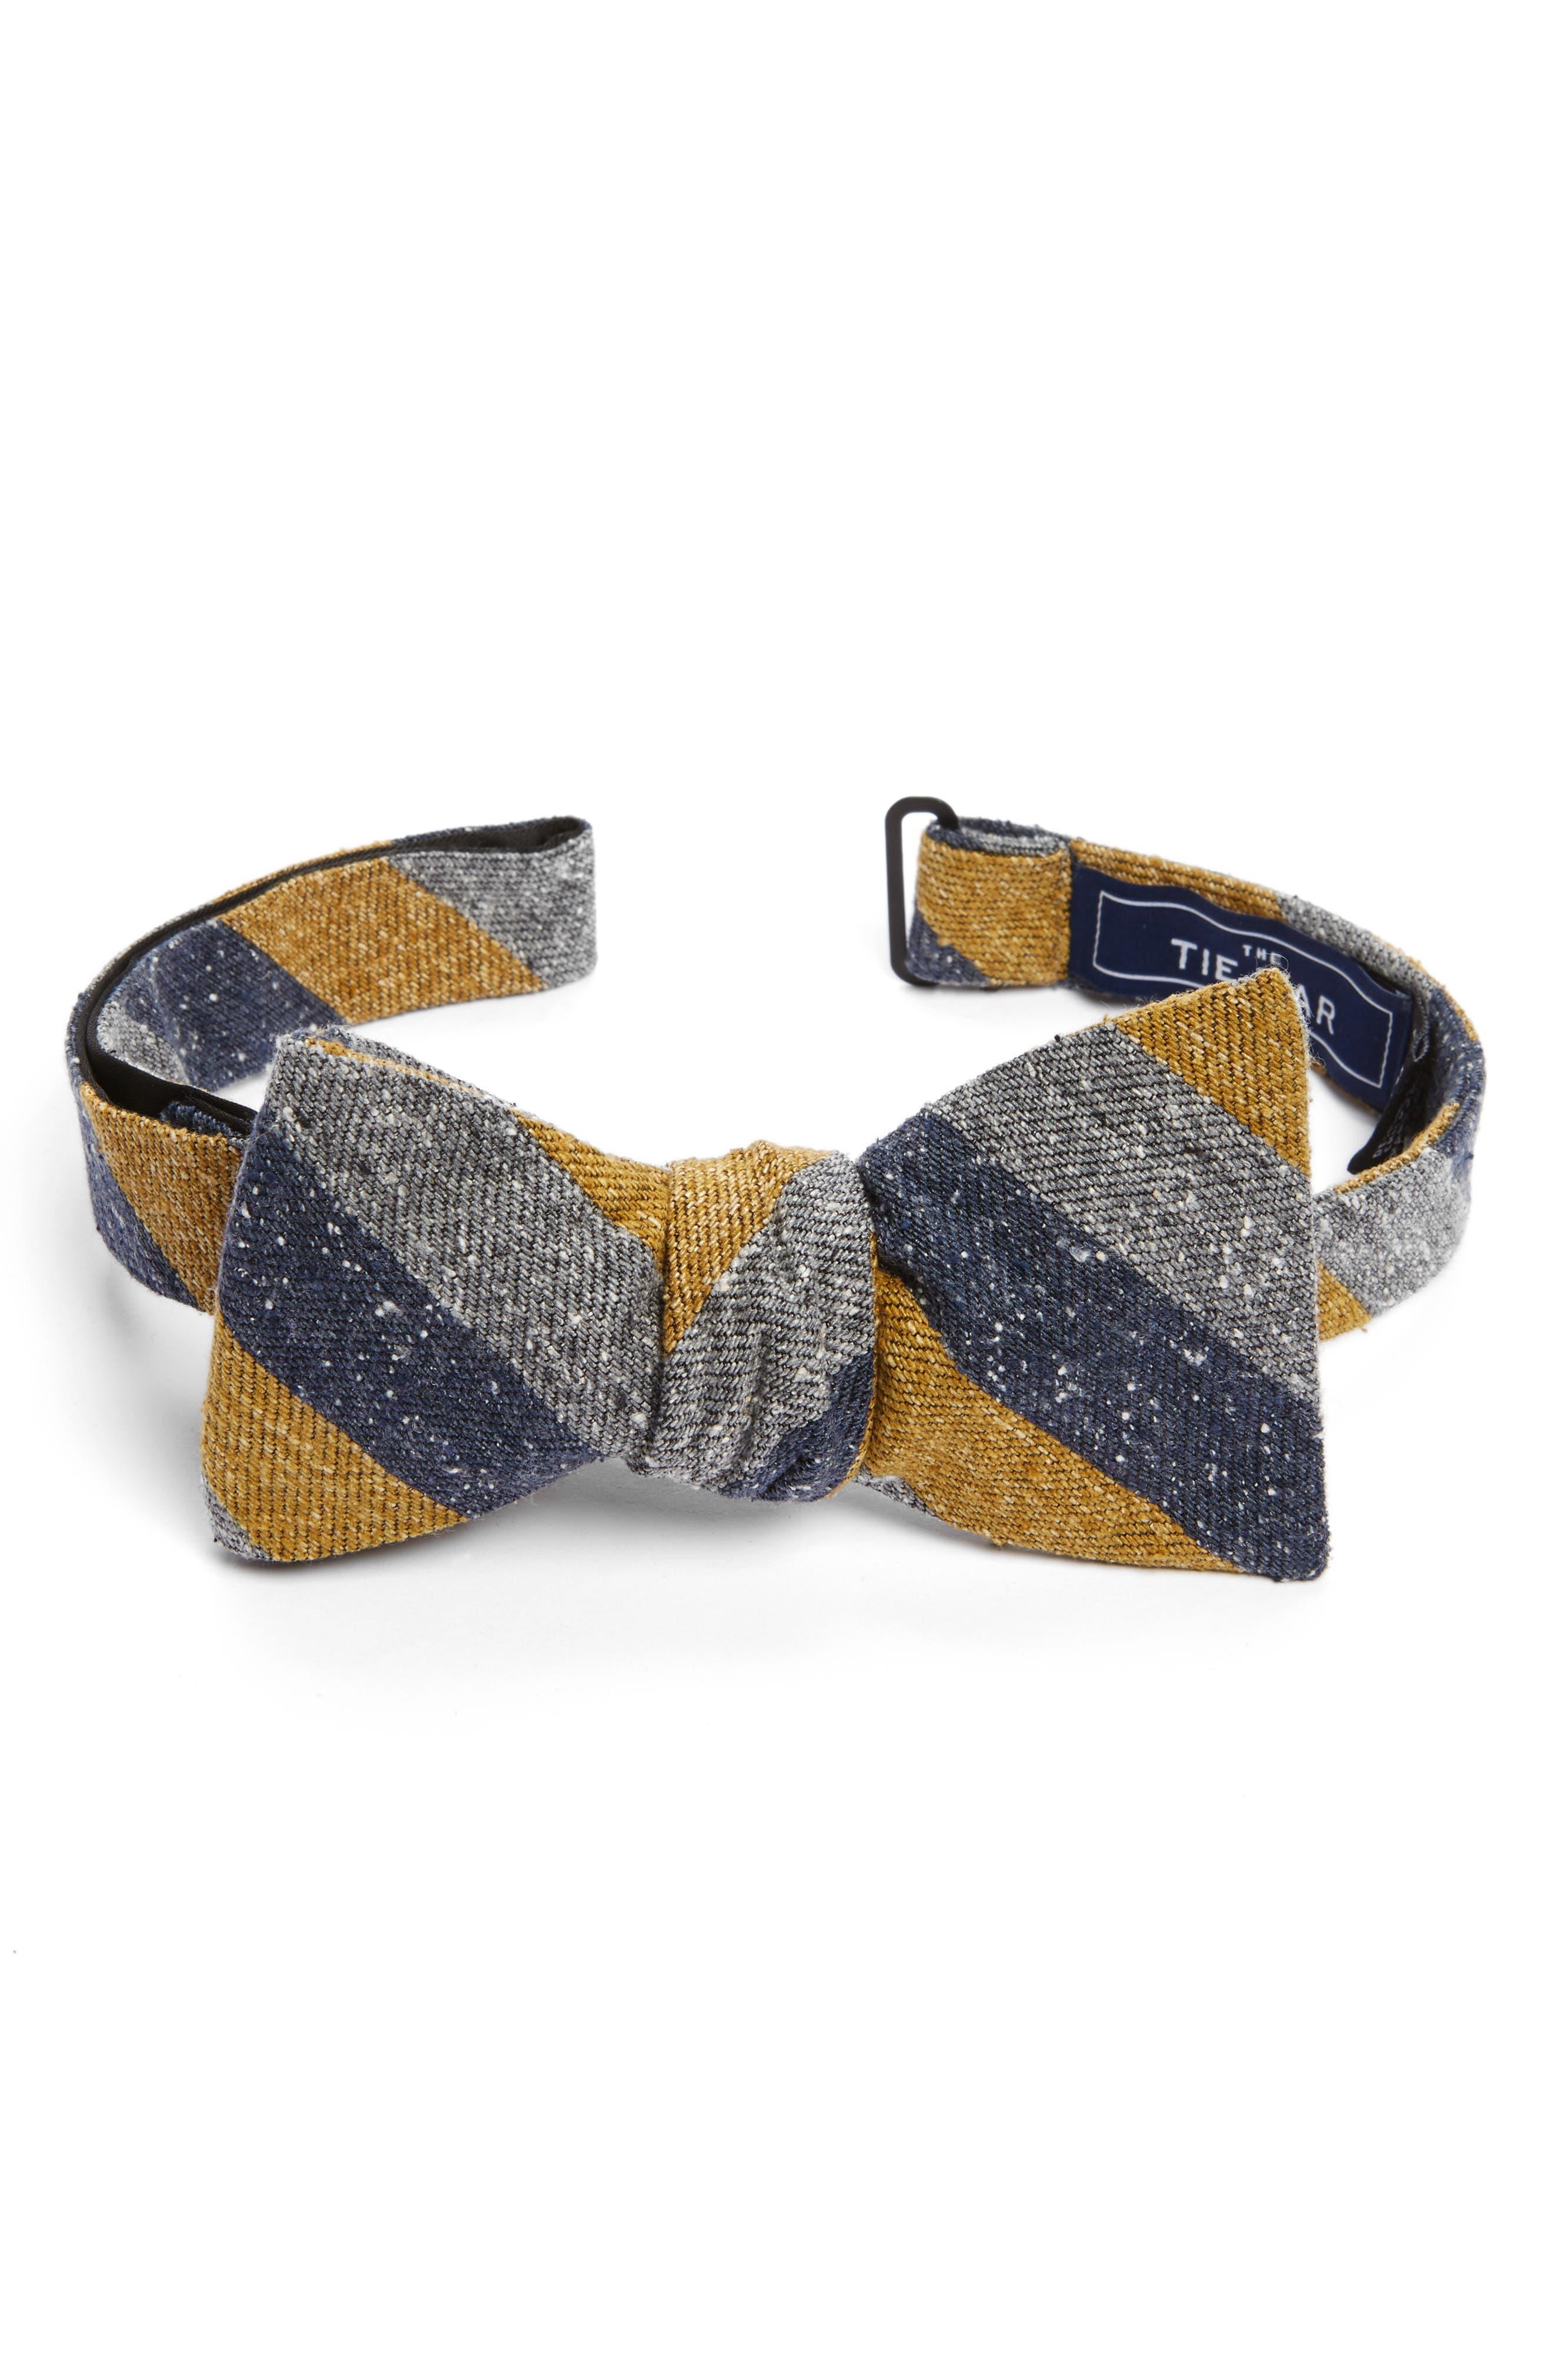 The Tie Bar Varios Stripe Silk Bow Tie